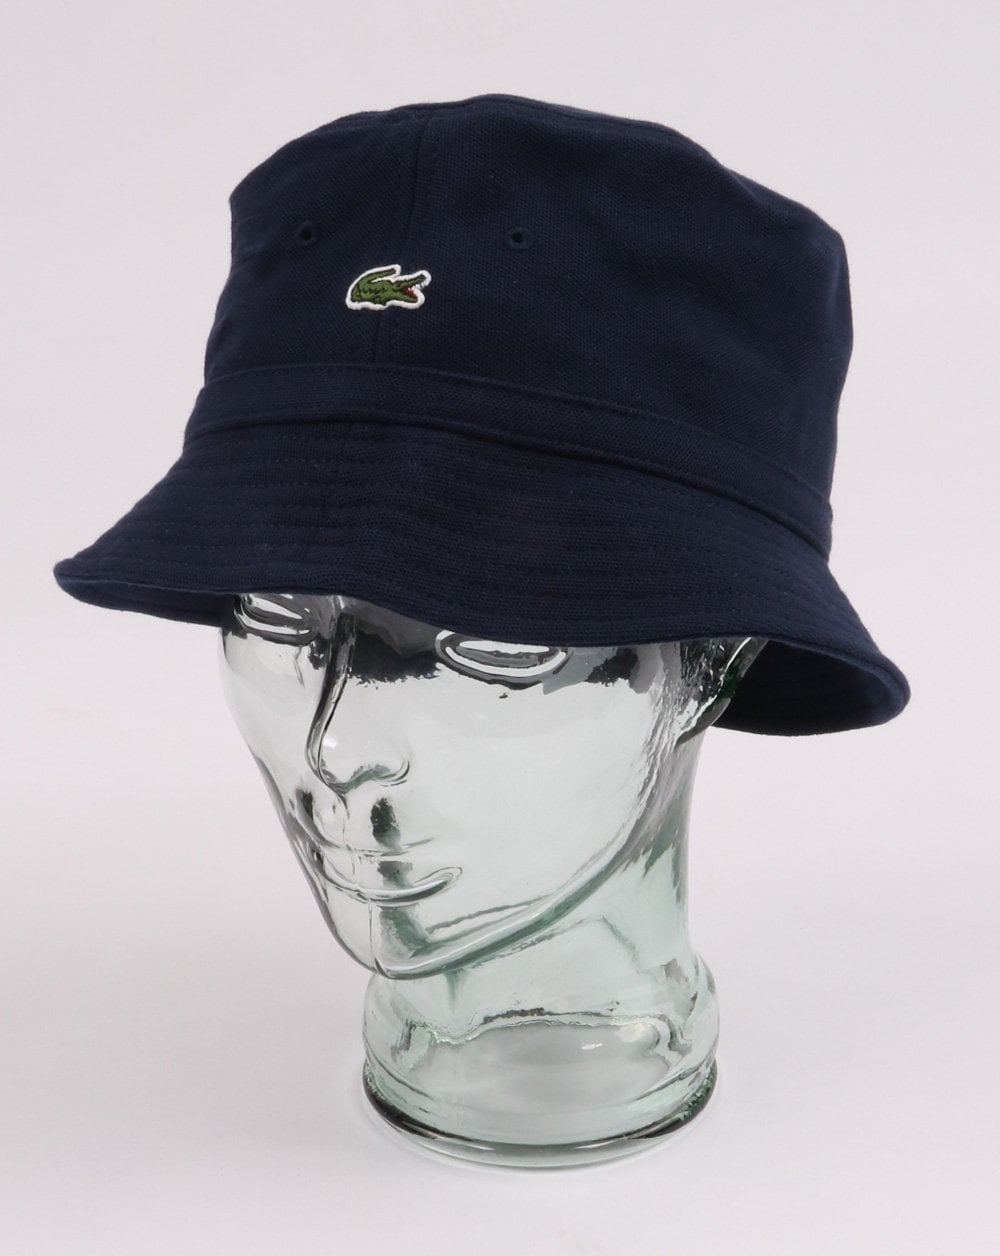 e673709cda30dc Lacoste Bucket Hat in Navy | 80s Casual Classics